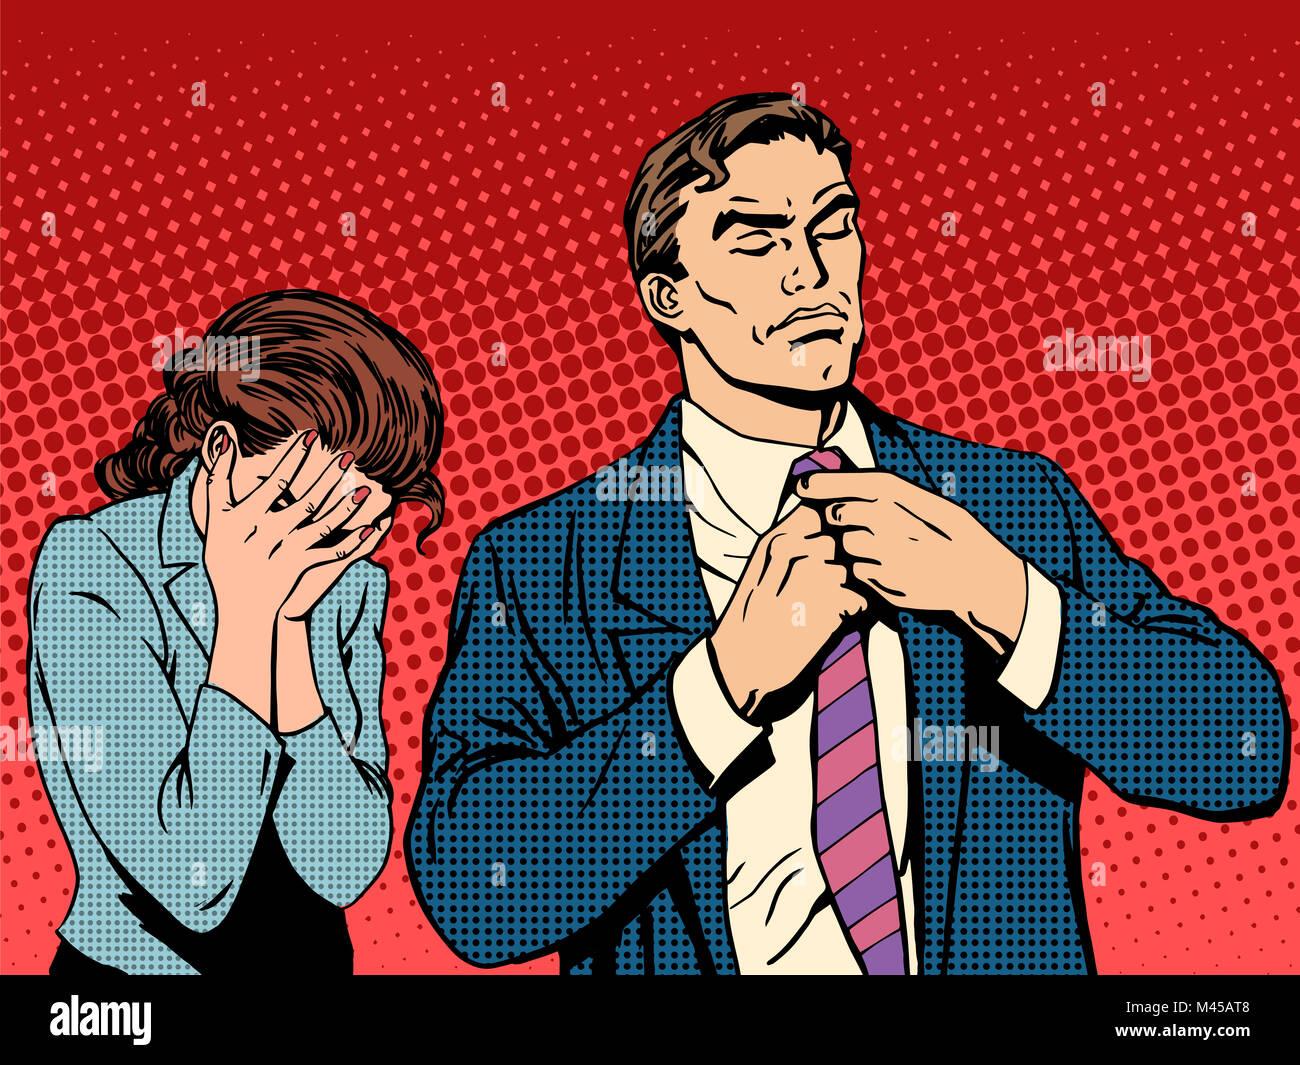 Family quarrel man leaves woman cries - Stock Image